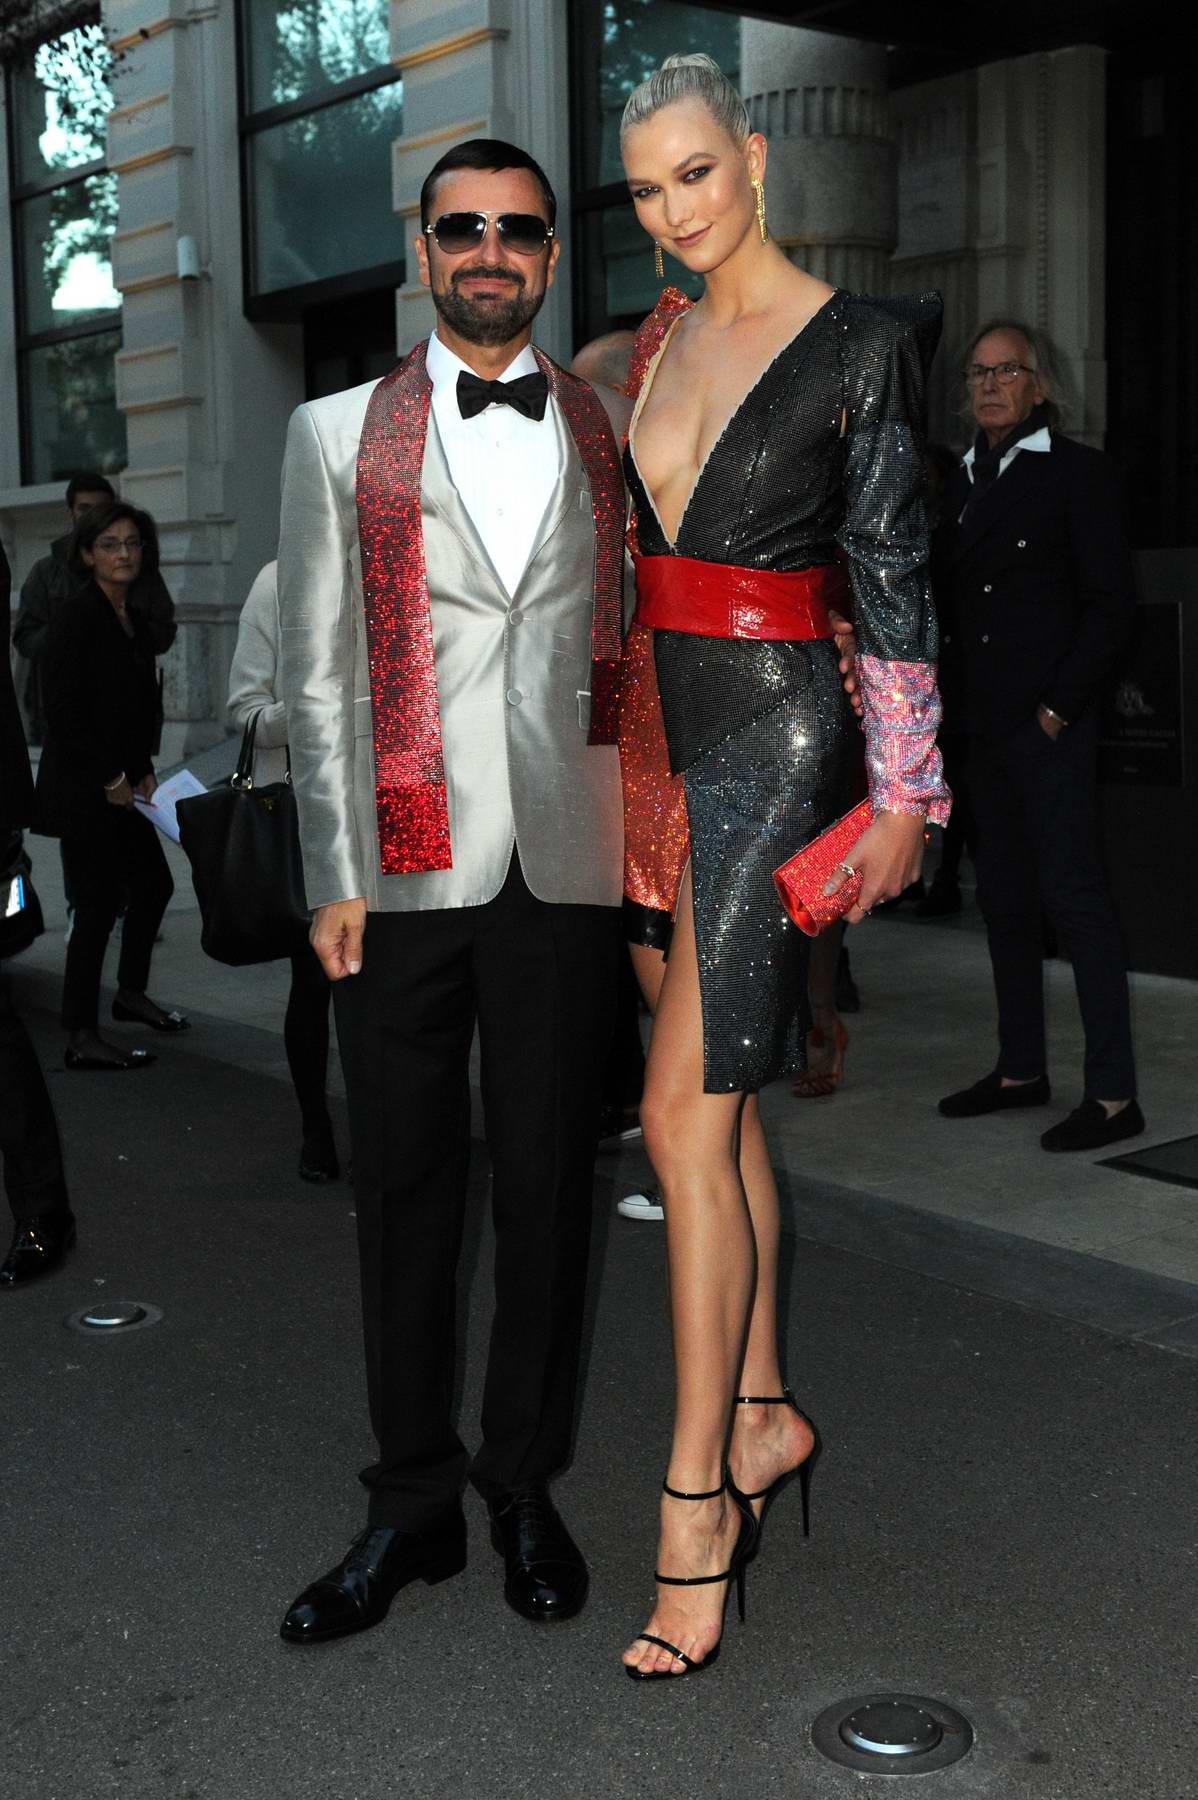 Karlie Kloss seen leaving her hotel in Milan, Italy